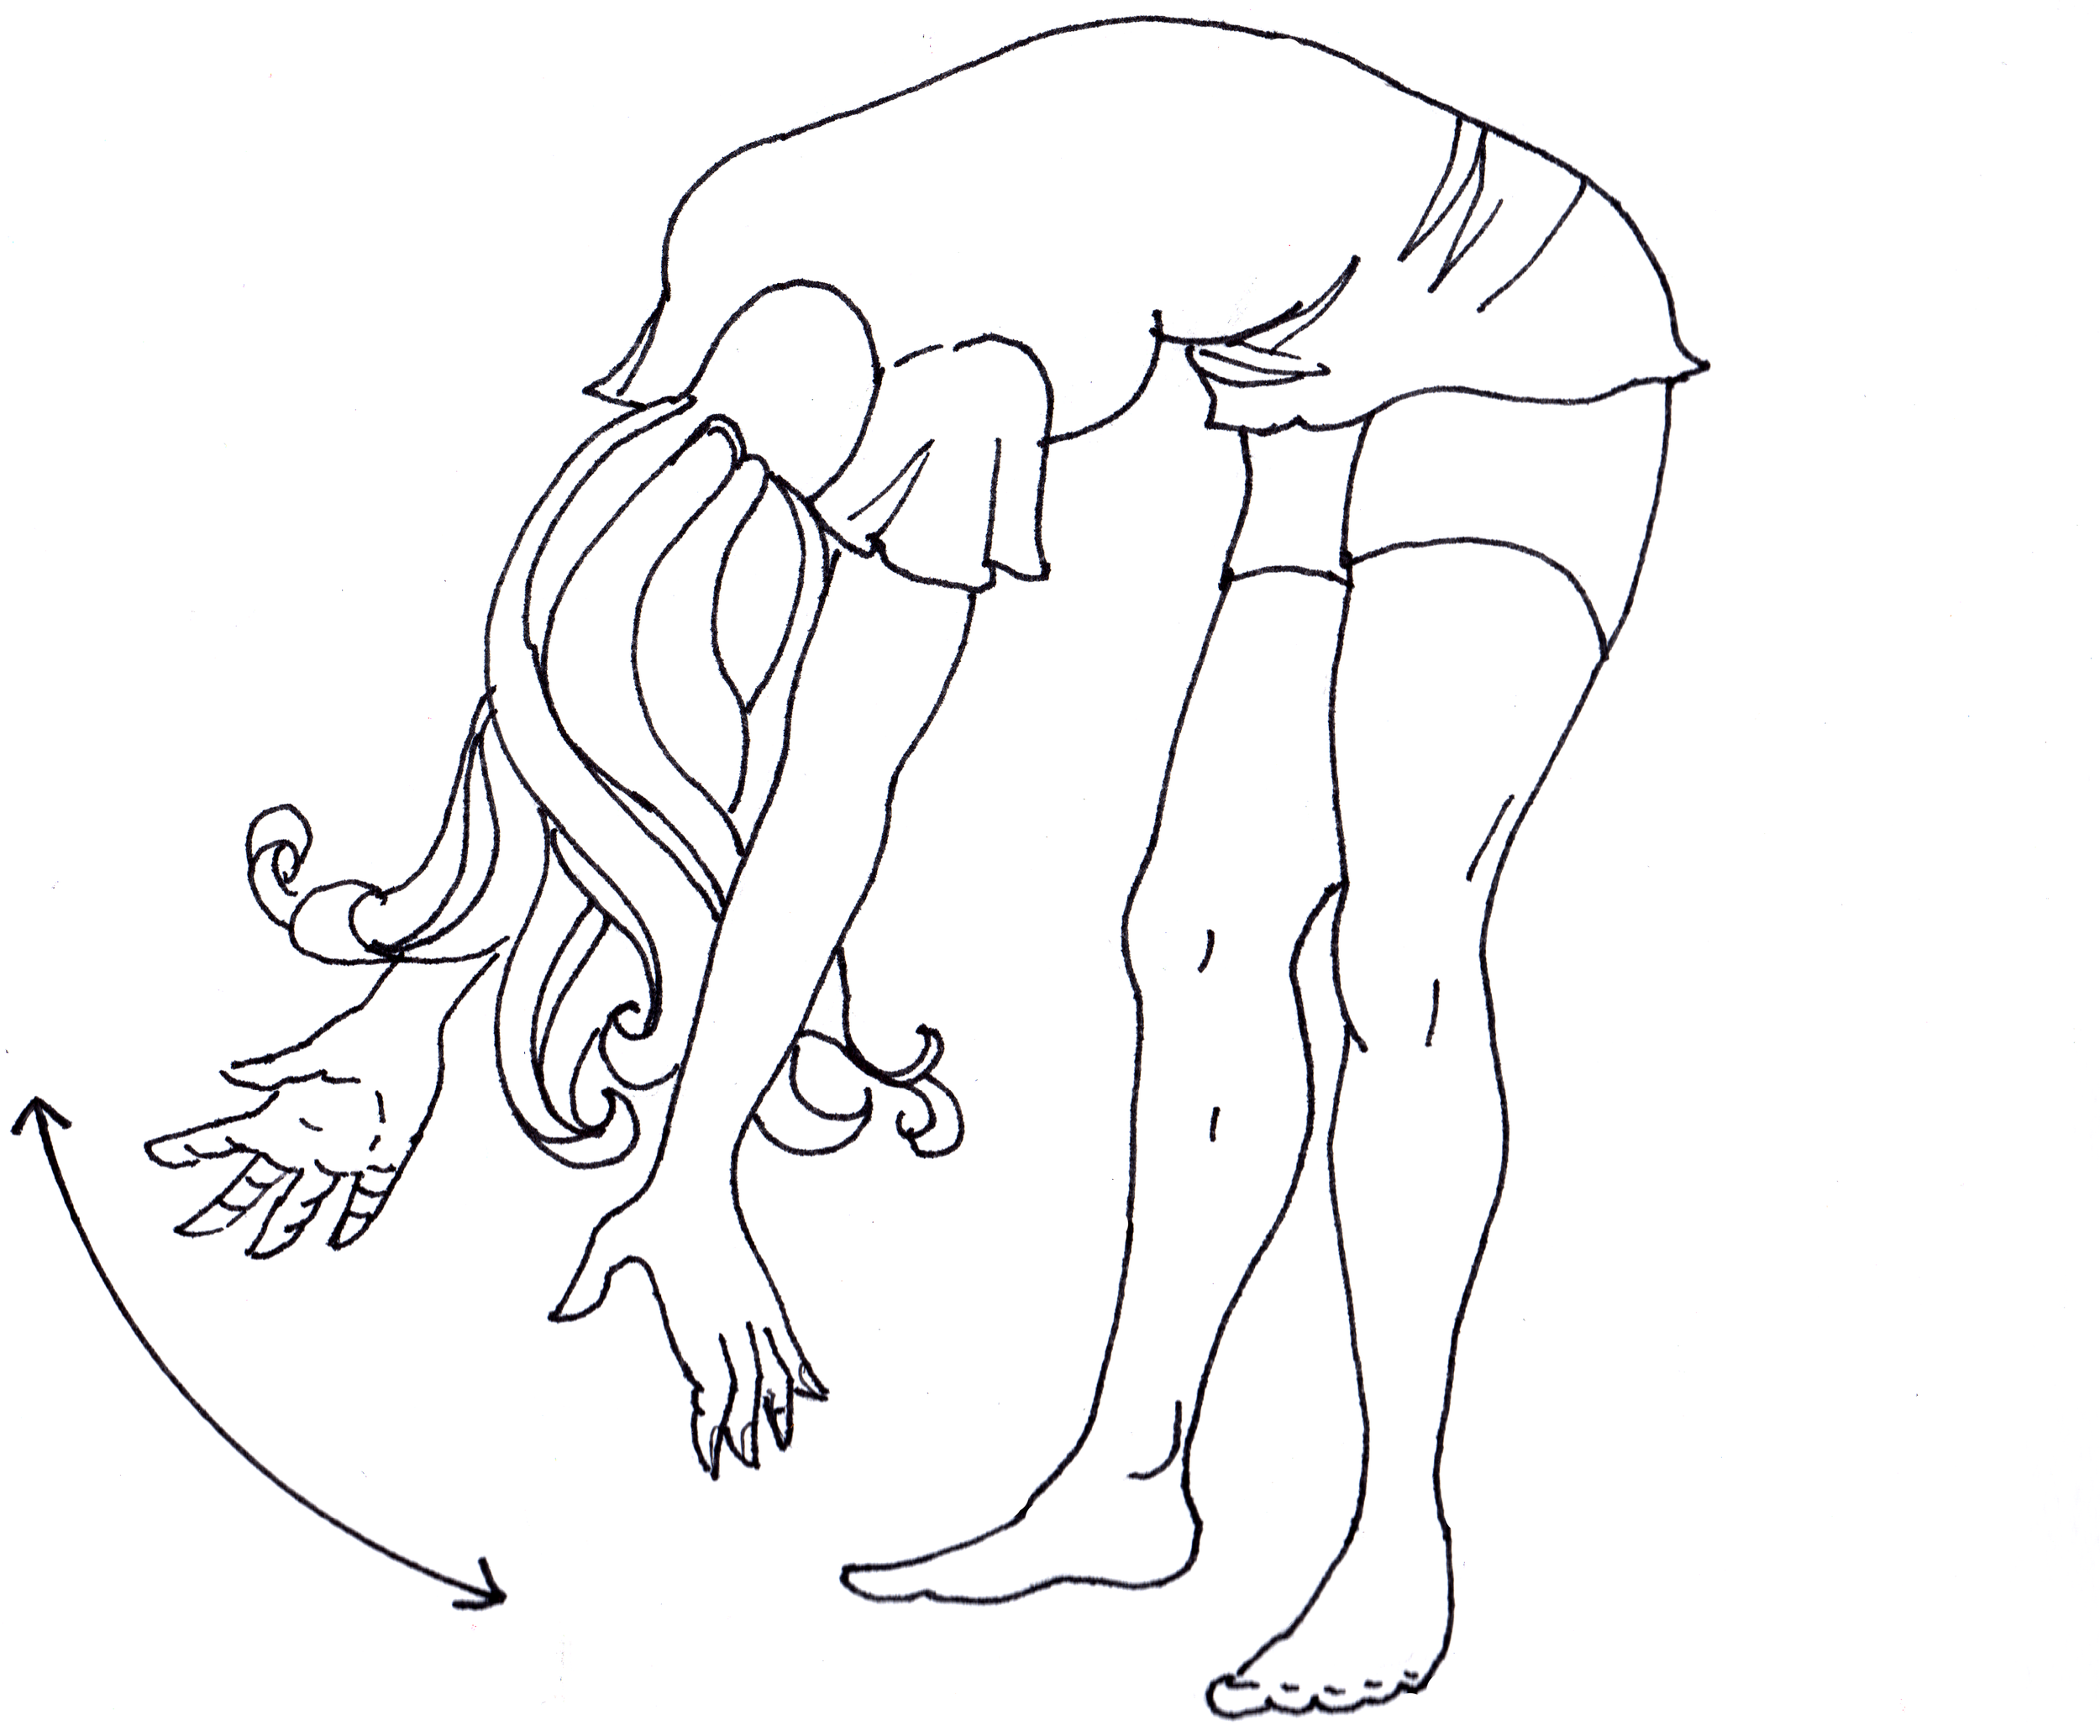 Drawing 003.png